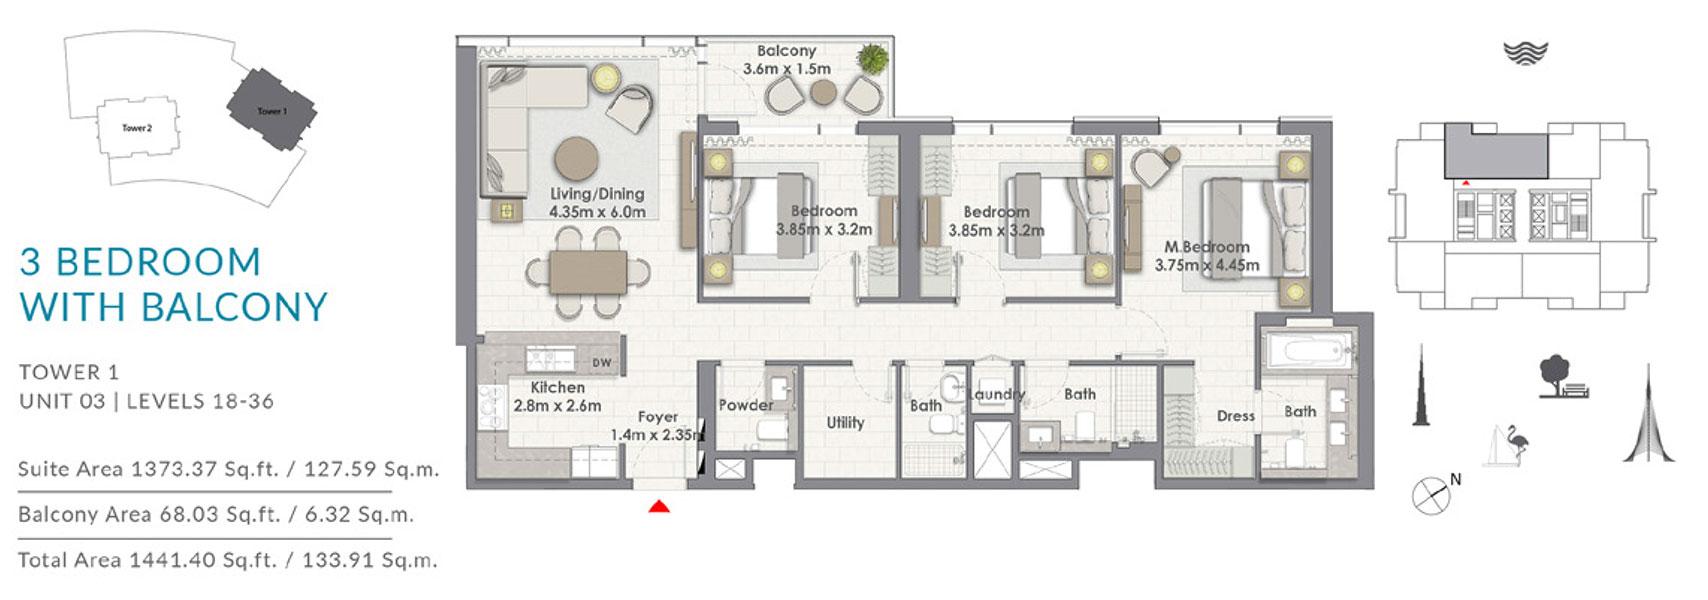 3BR-Balcony-T1-U3-L-18-36